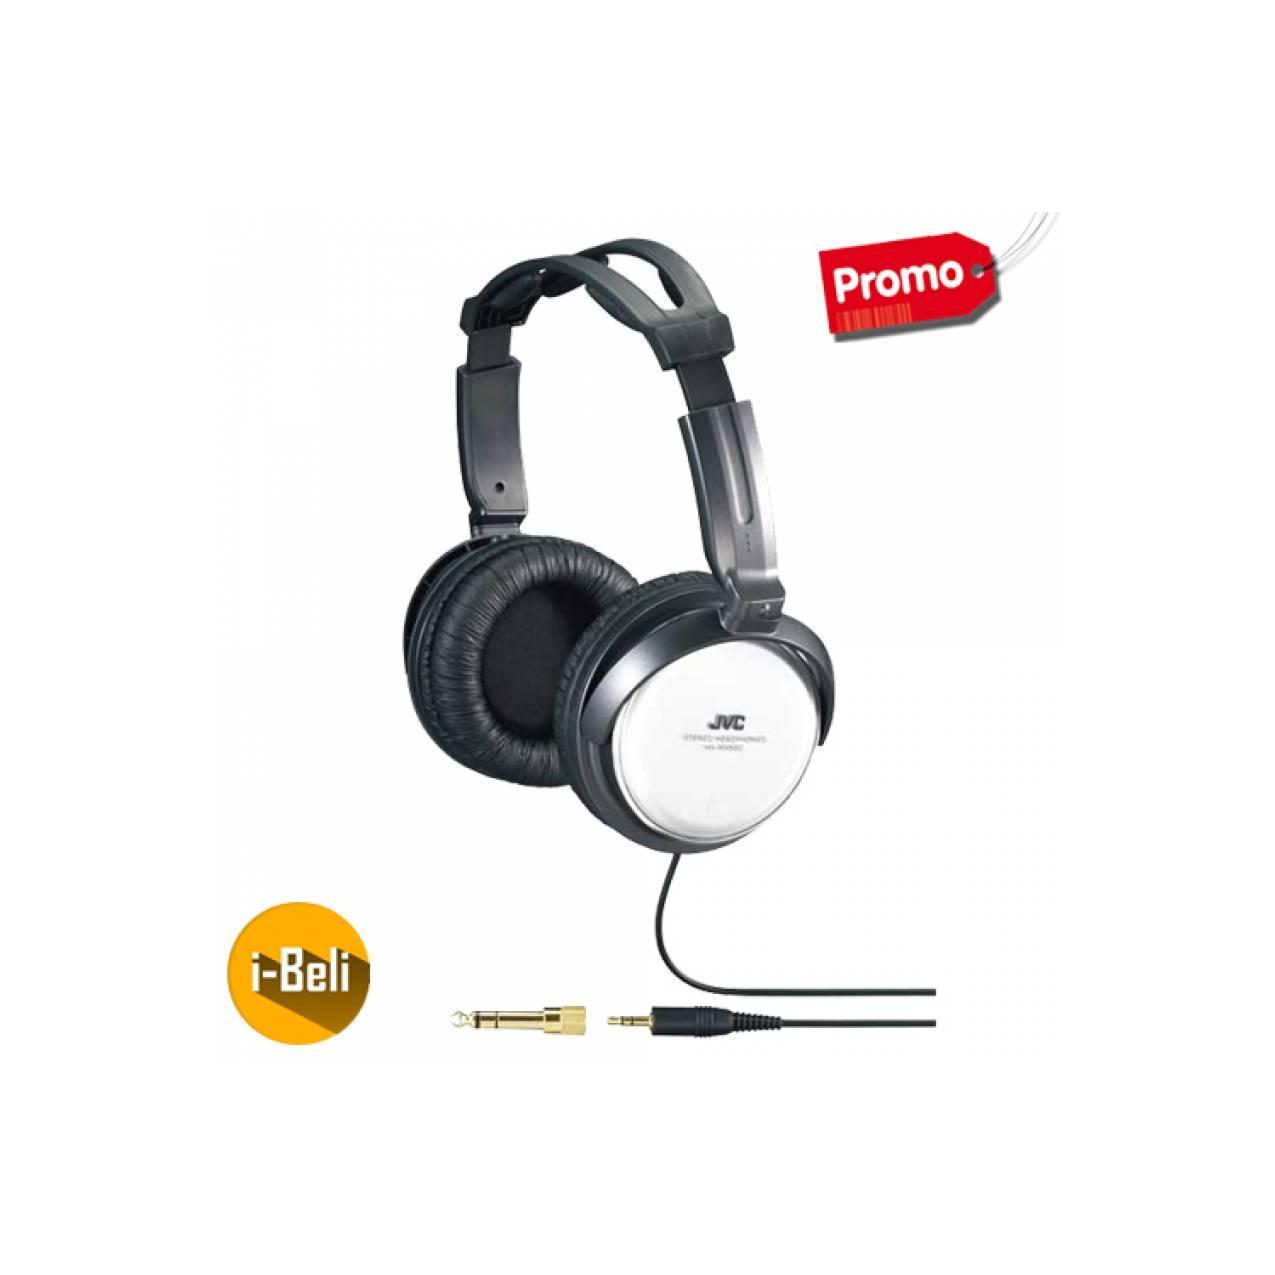 Jvc Headphone Ha S200 White Original Garansi Resmi 2 Tahun Spec Fx8 Riptidz Iem Earphone Rx500 Dynamic Headphones